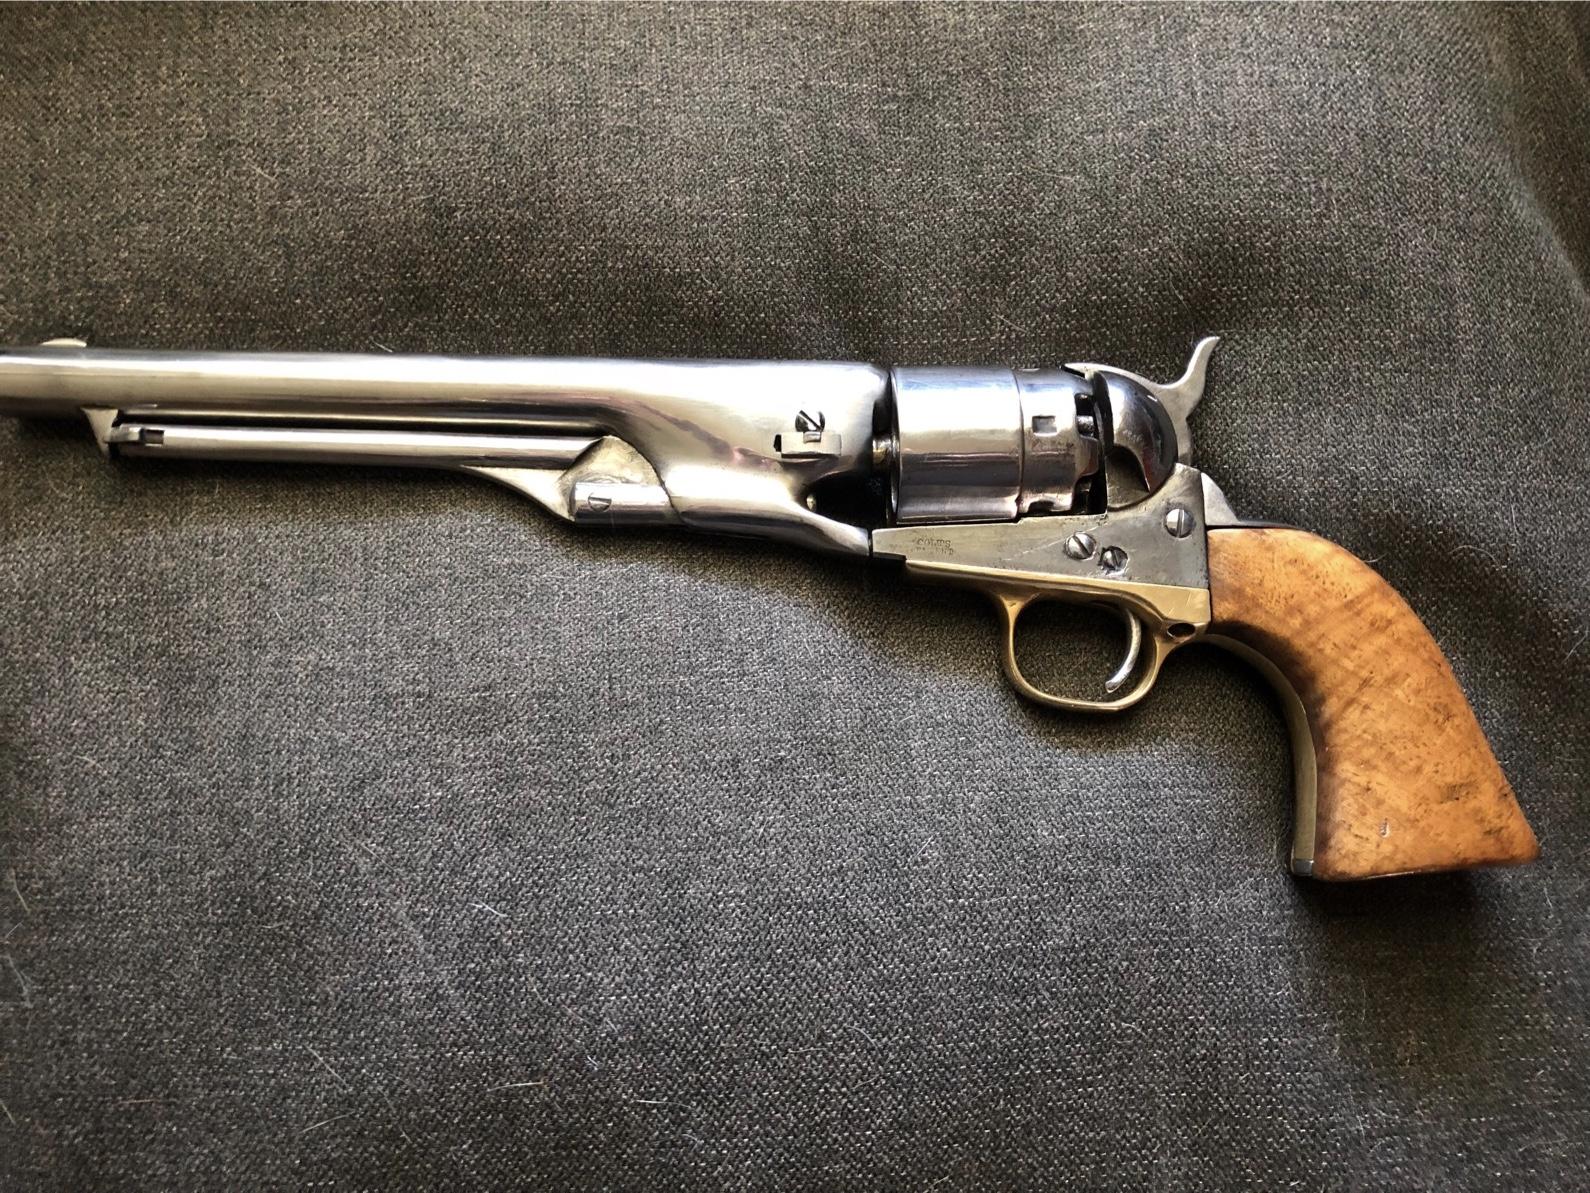 I have a burnside carbine serial number 3032 on the receiver